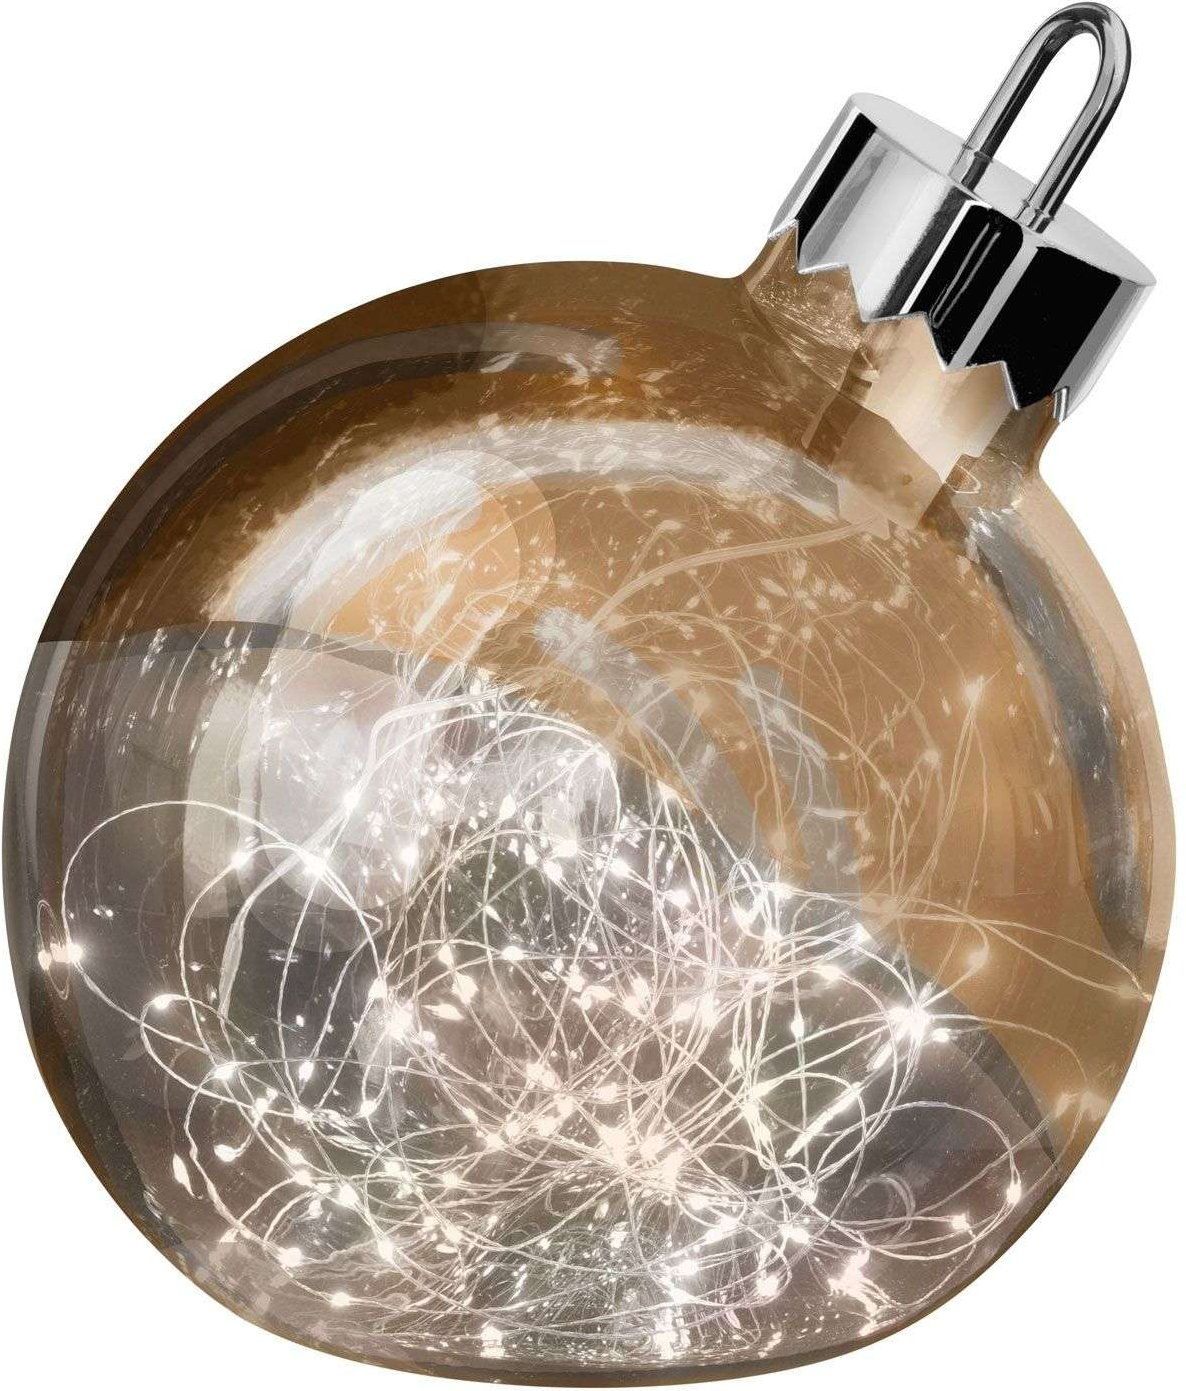 Ornament decorative light  copper  30 cm diameter